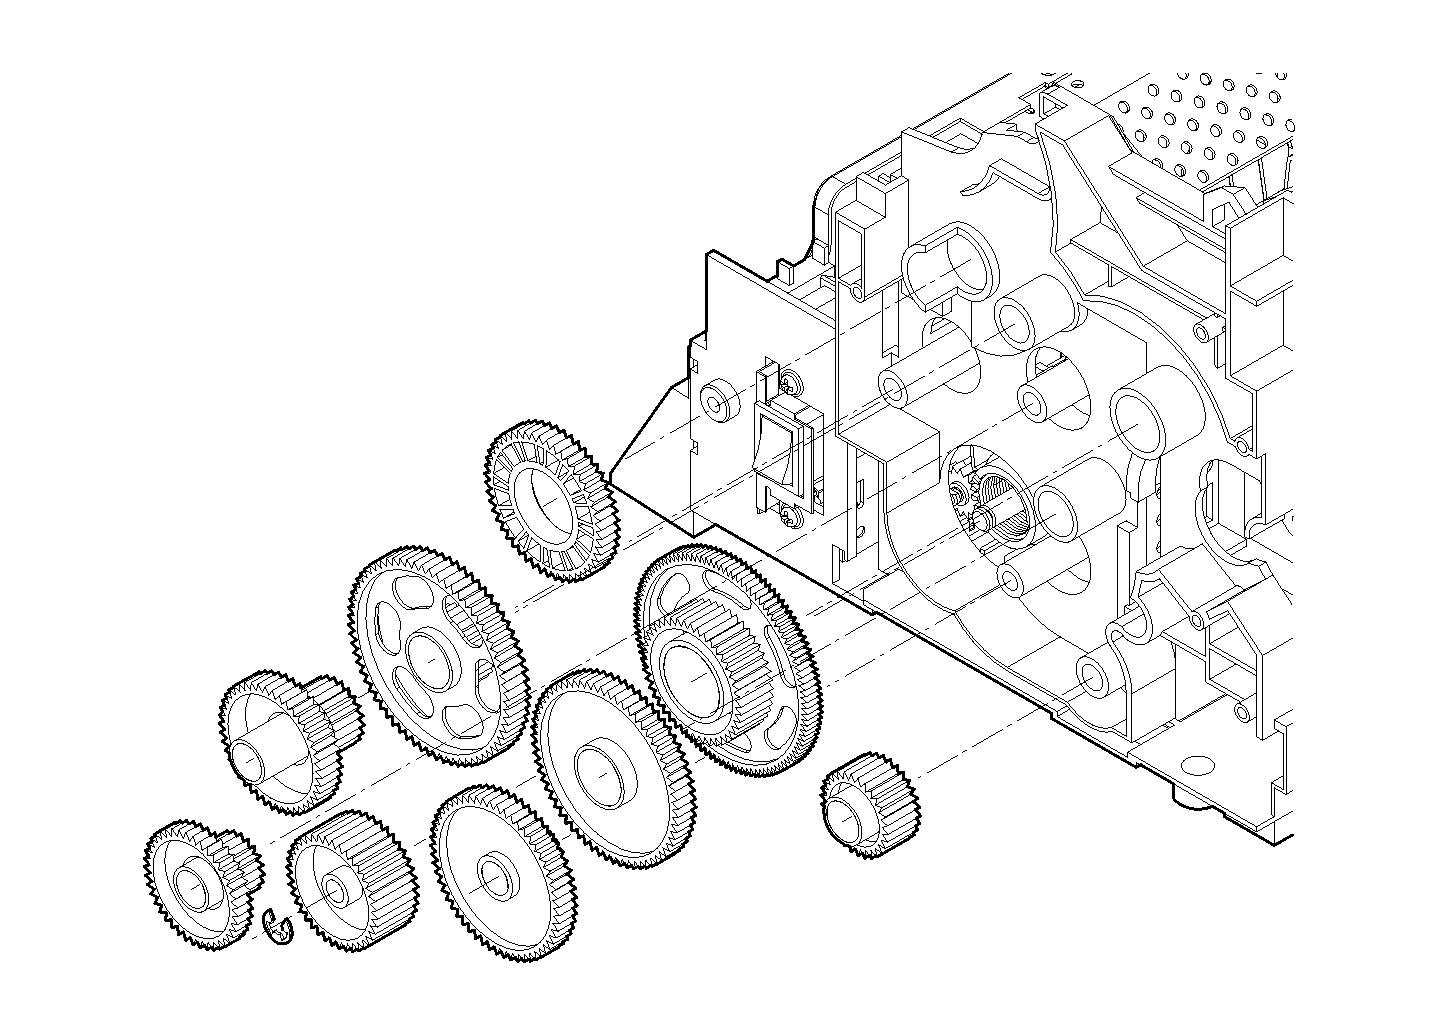 Machine Gear Placement Illustration